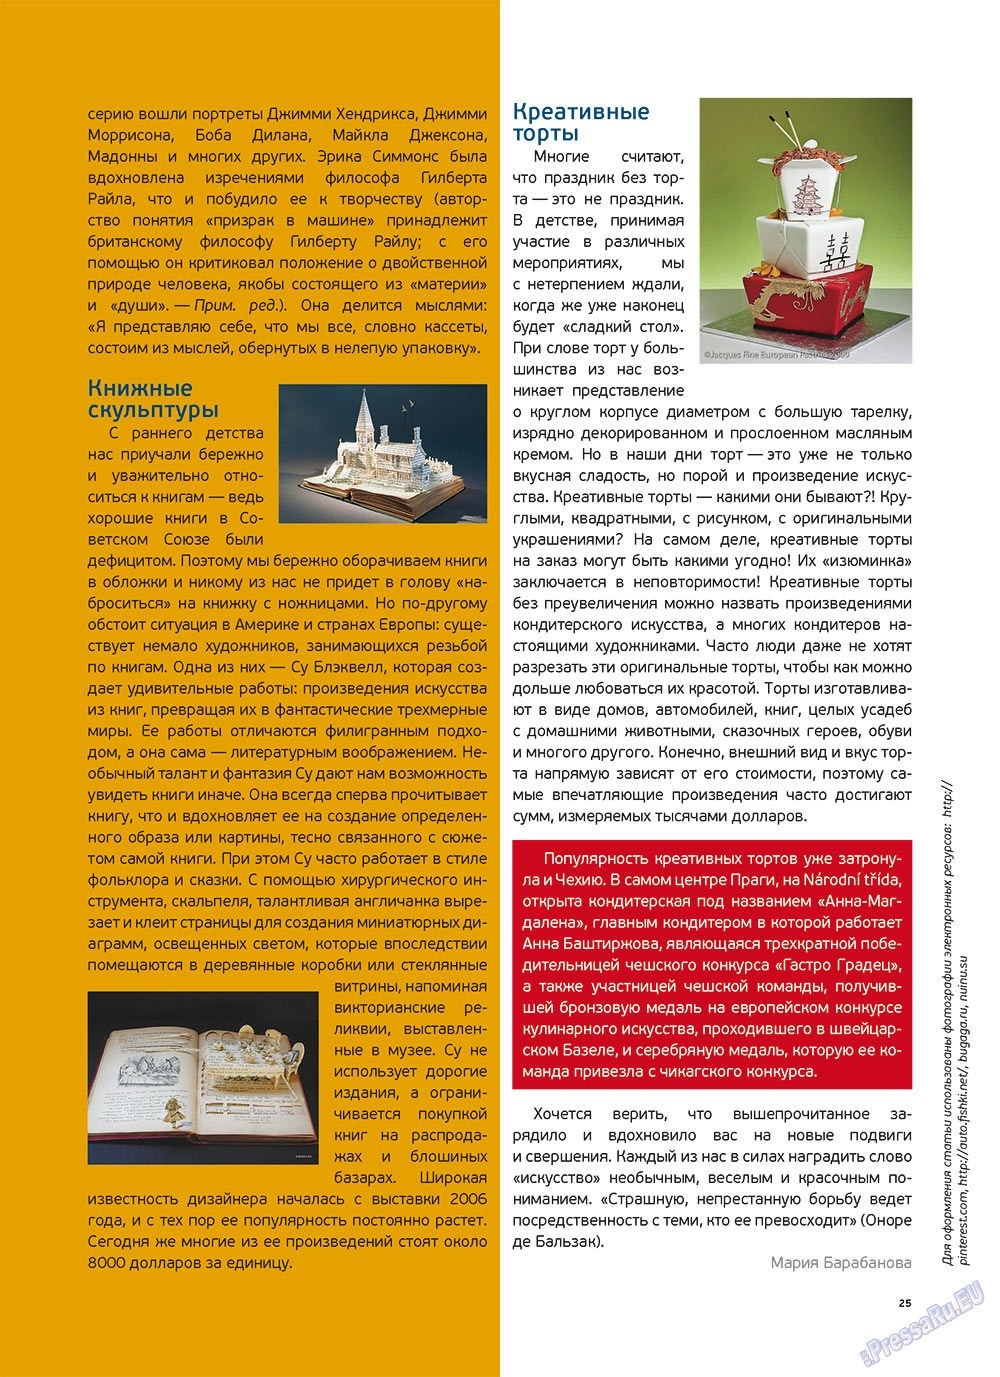 Артек (журнал). 2012 год, номер 3, стр. 27